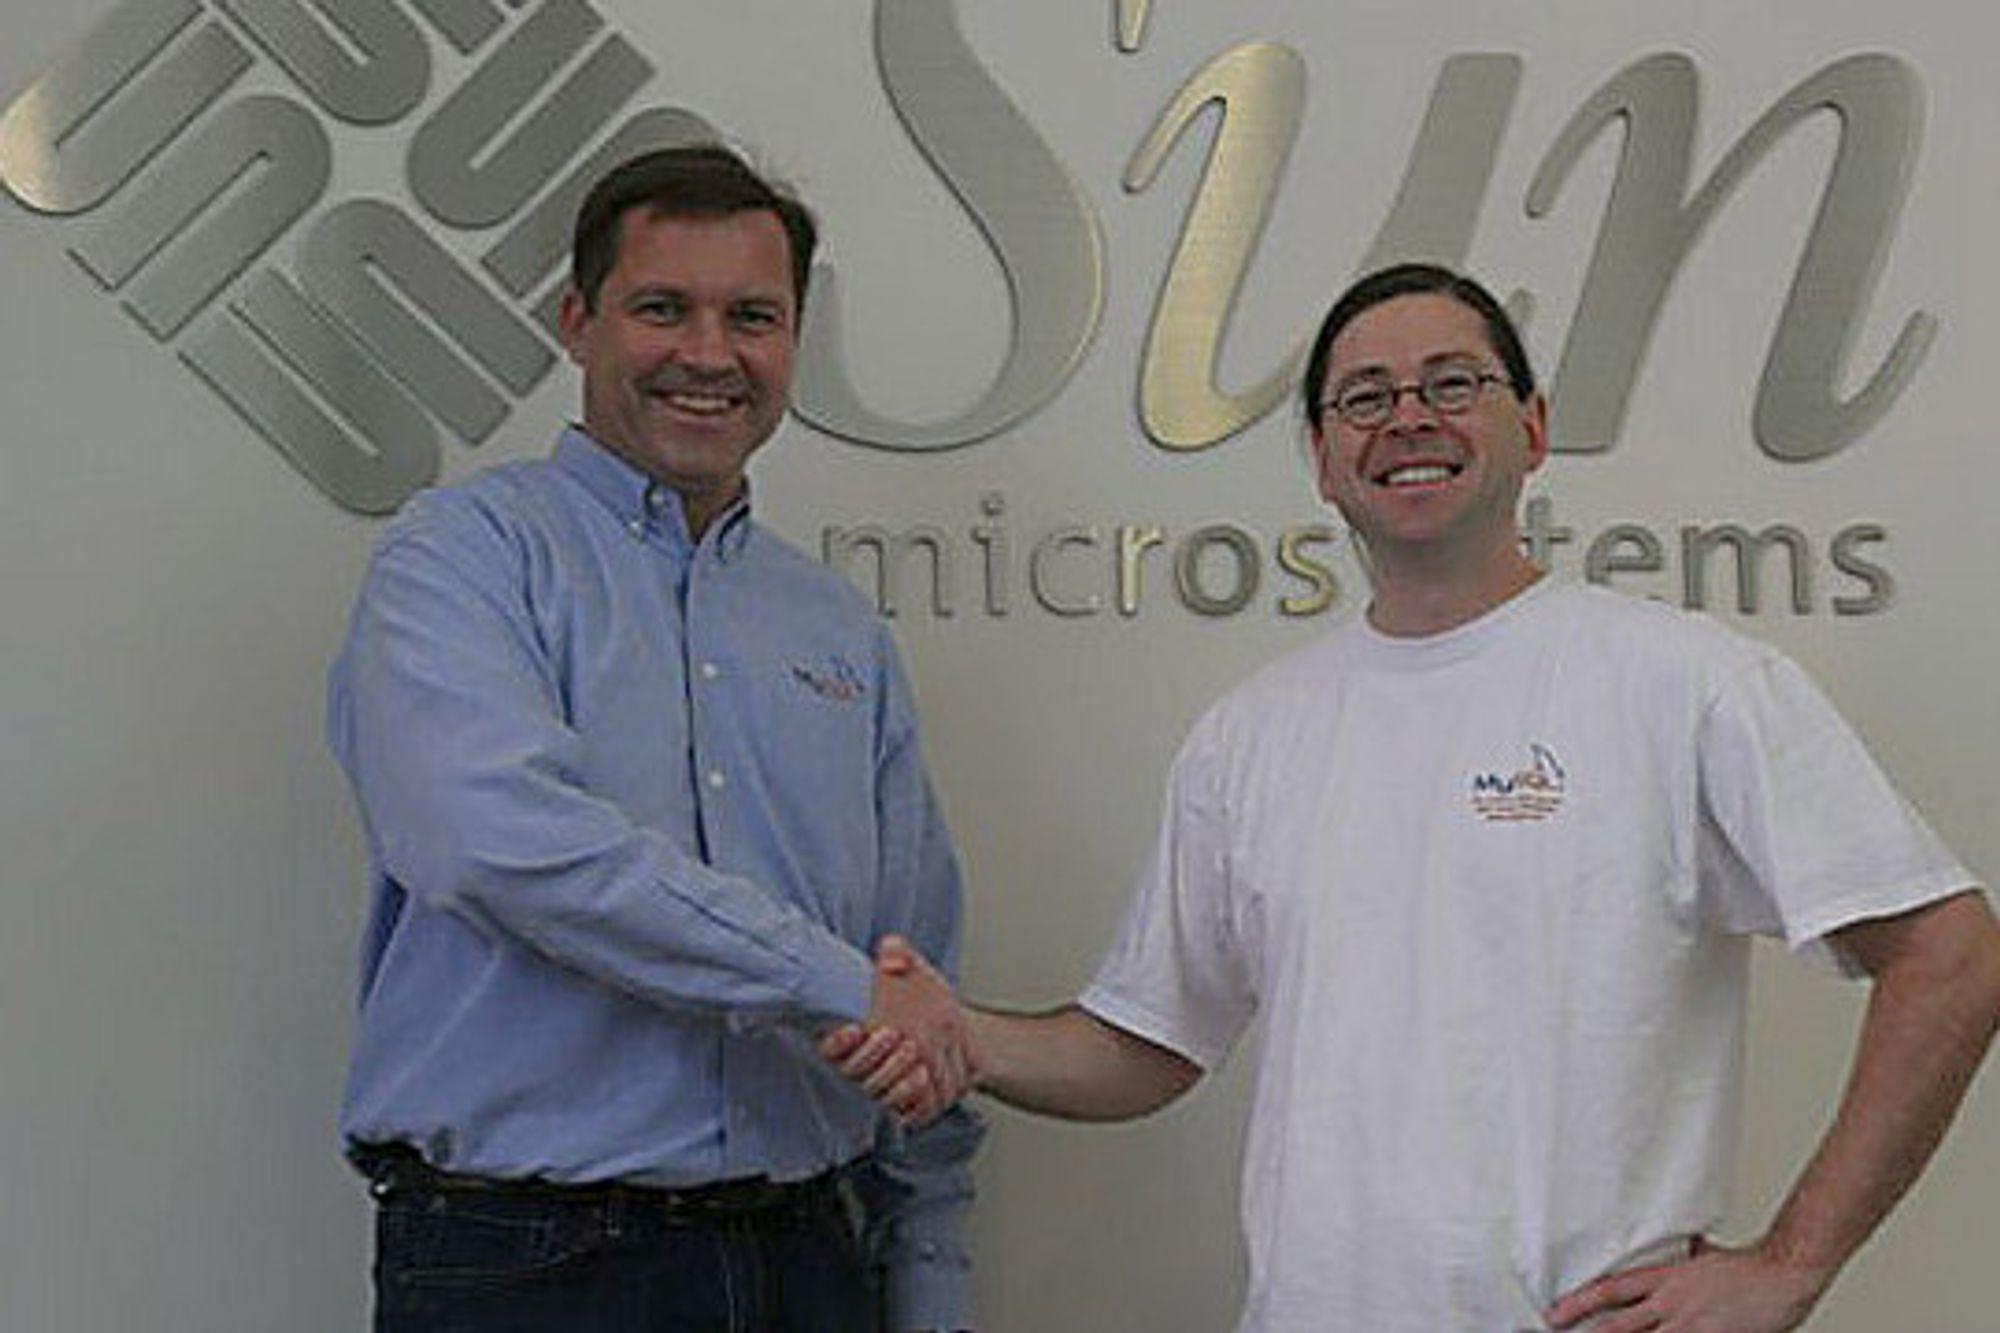 Jonathan Schwartz og Marten Mickos, CEO i MySQL